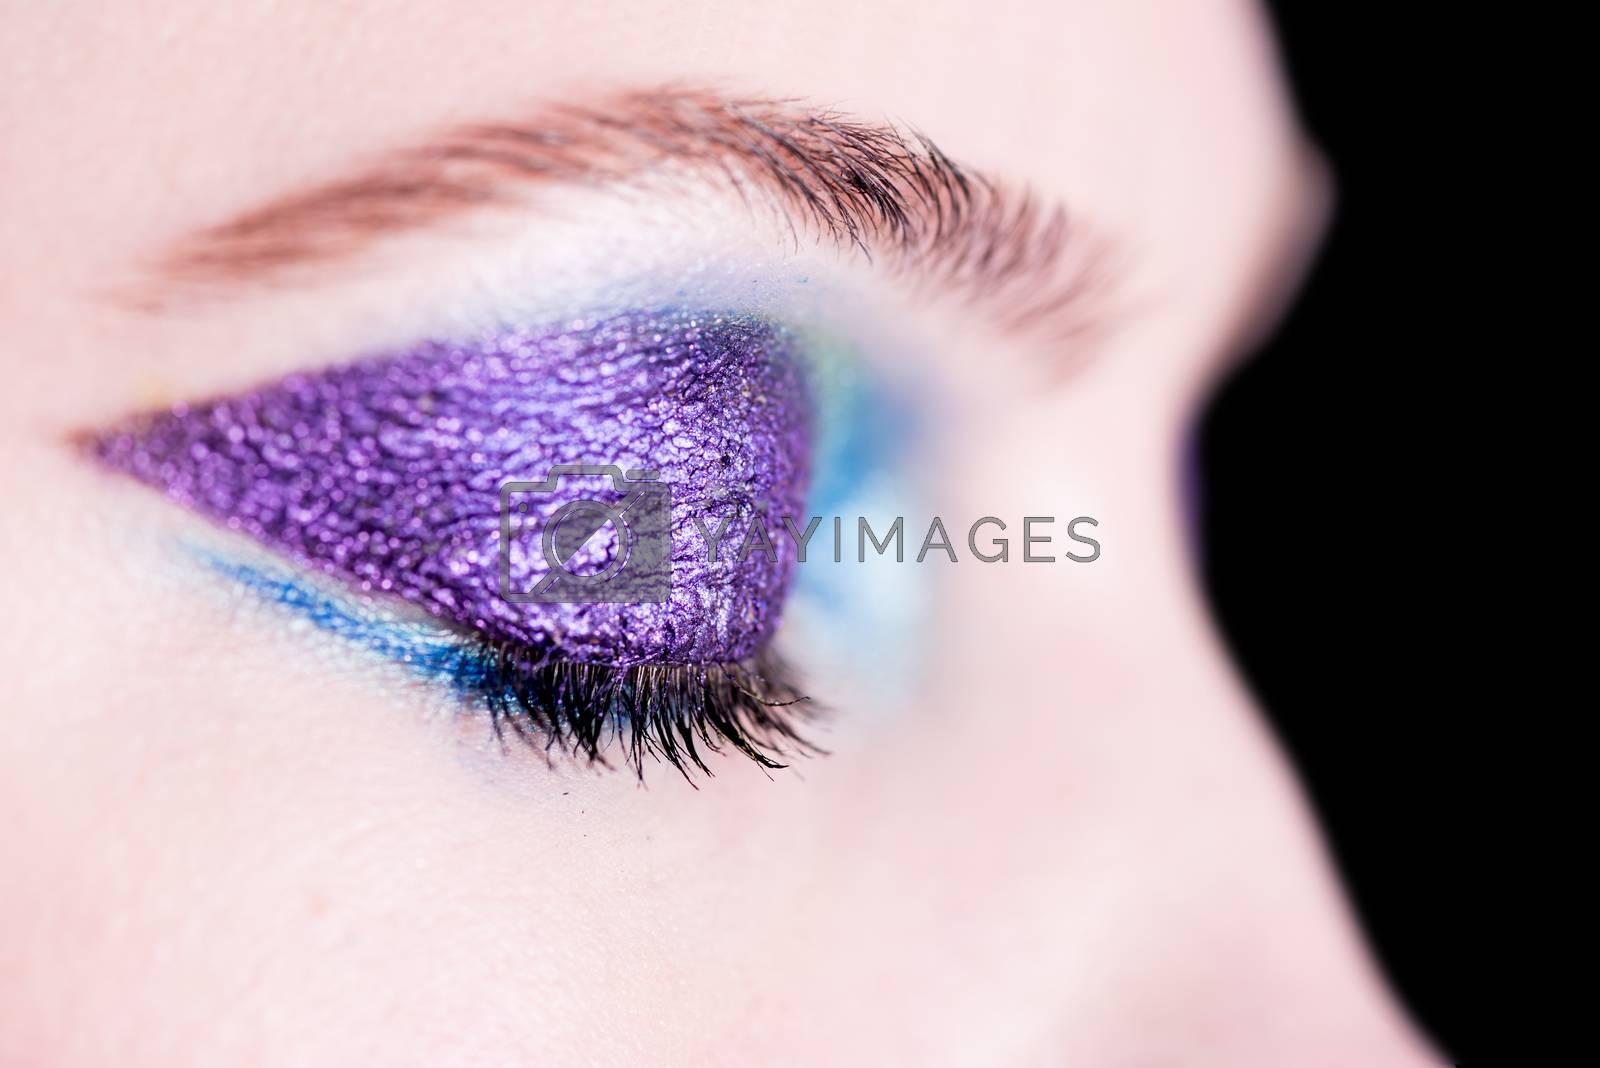 Image of a woman eye with purple eye-shadow